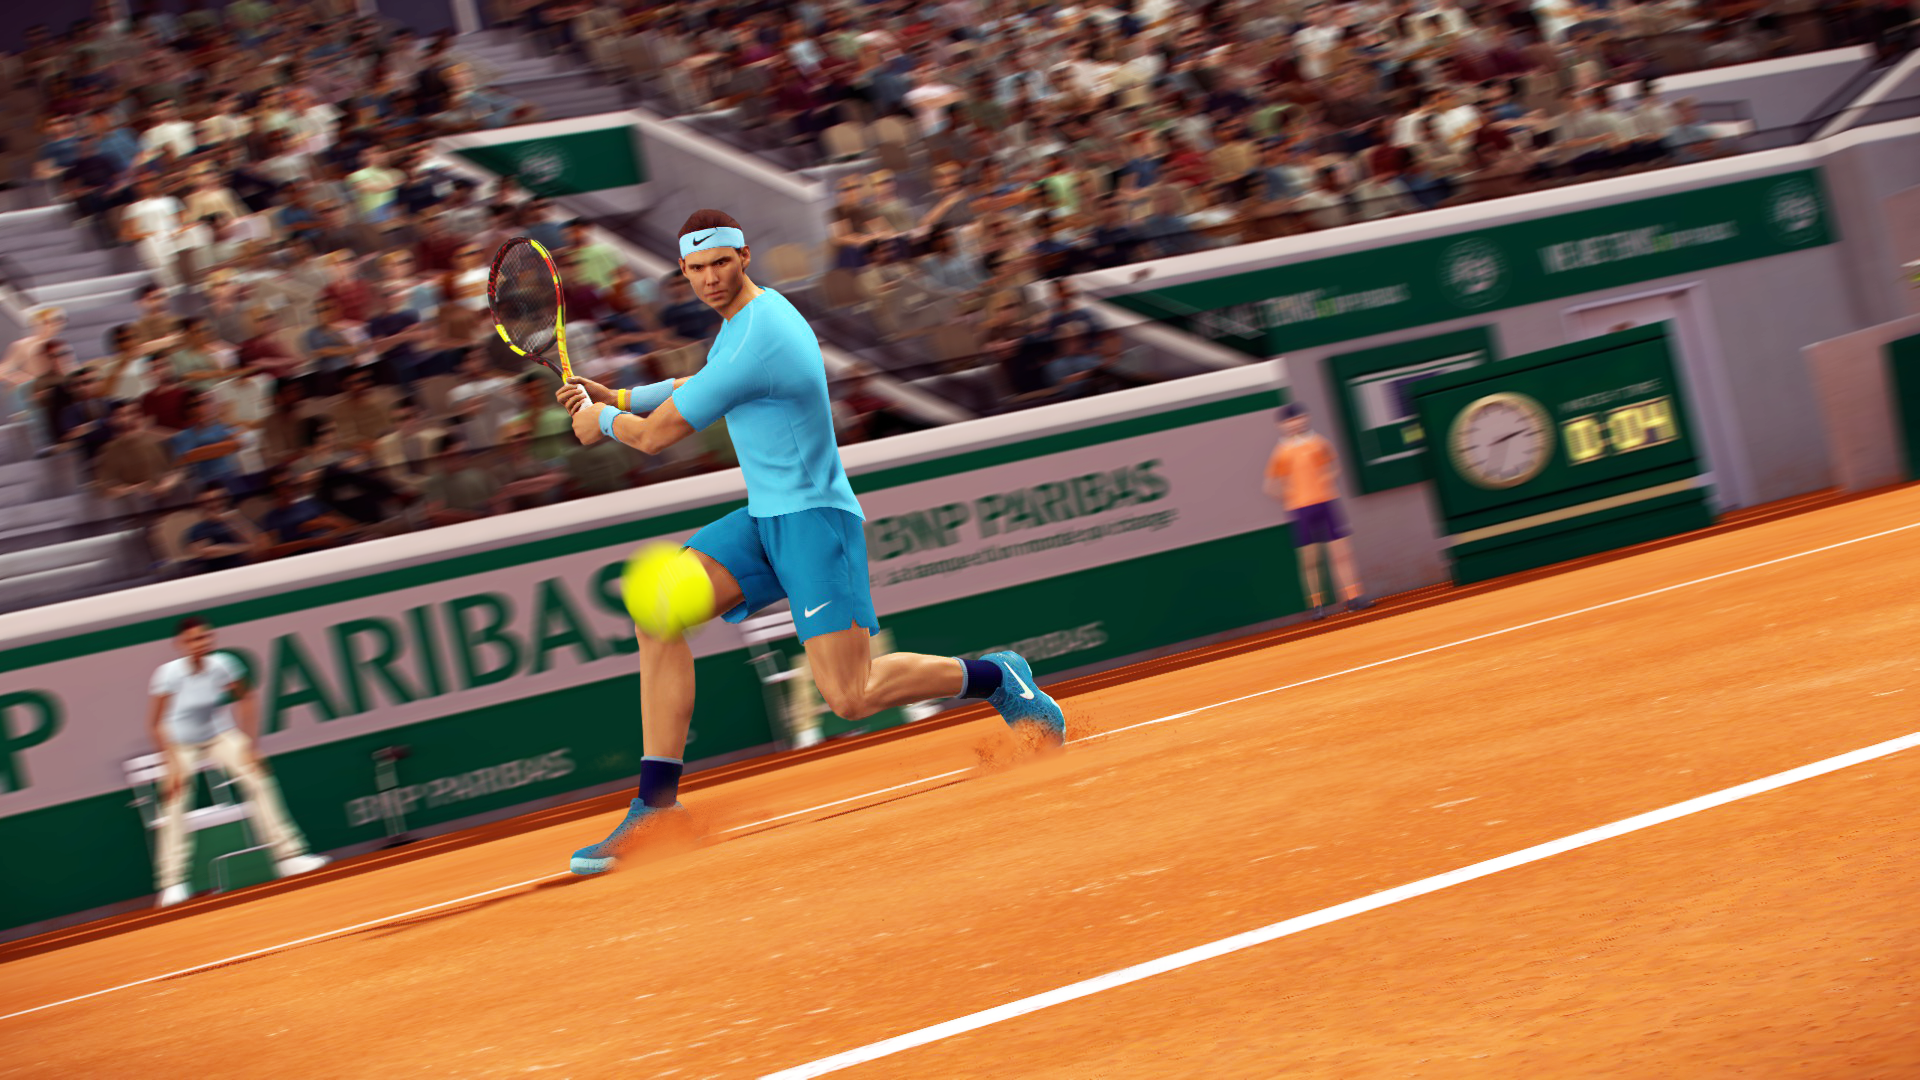 Big Ben - Roland-Garros - The 2020 Roland-Garros Tournament official